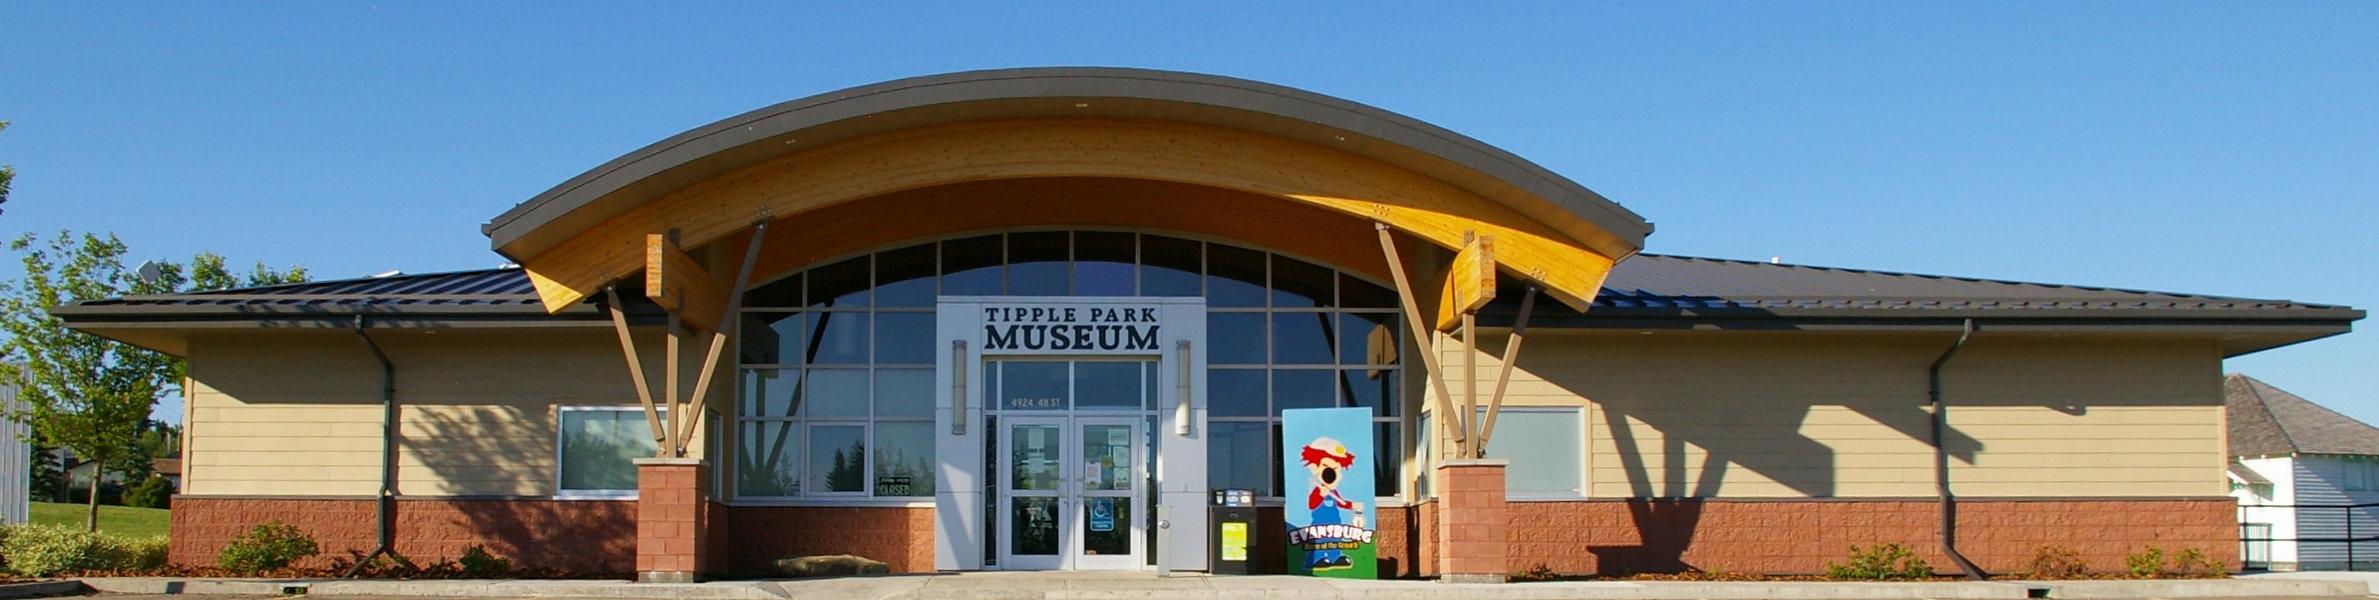 Tipple Park Museum